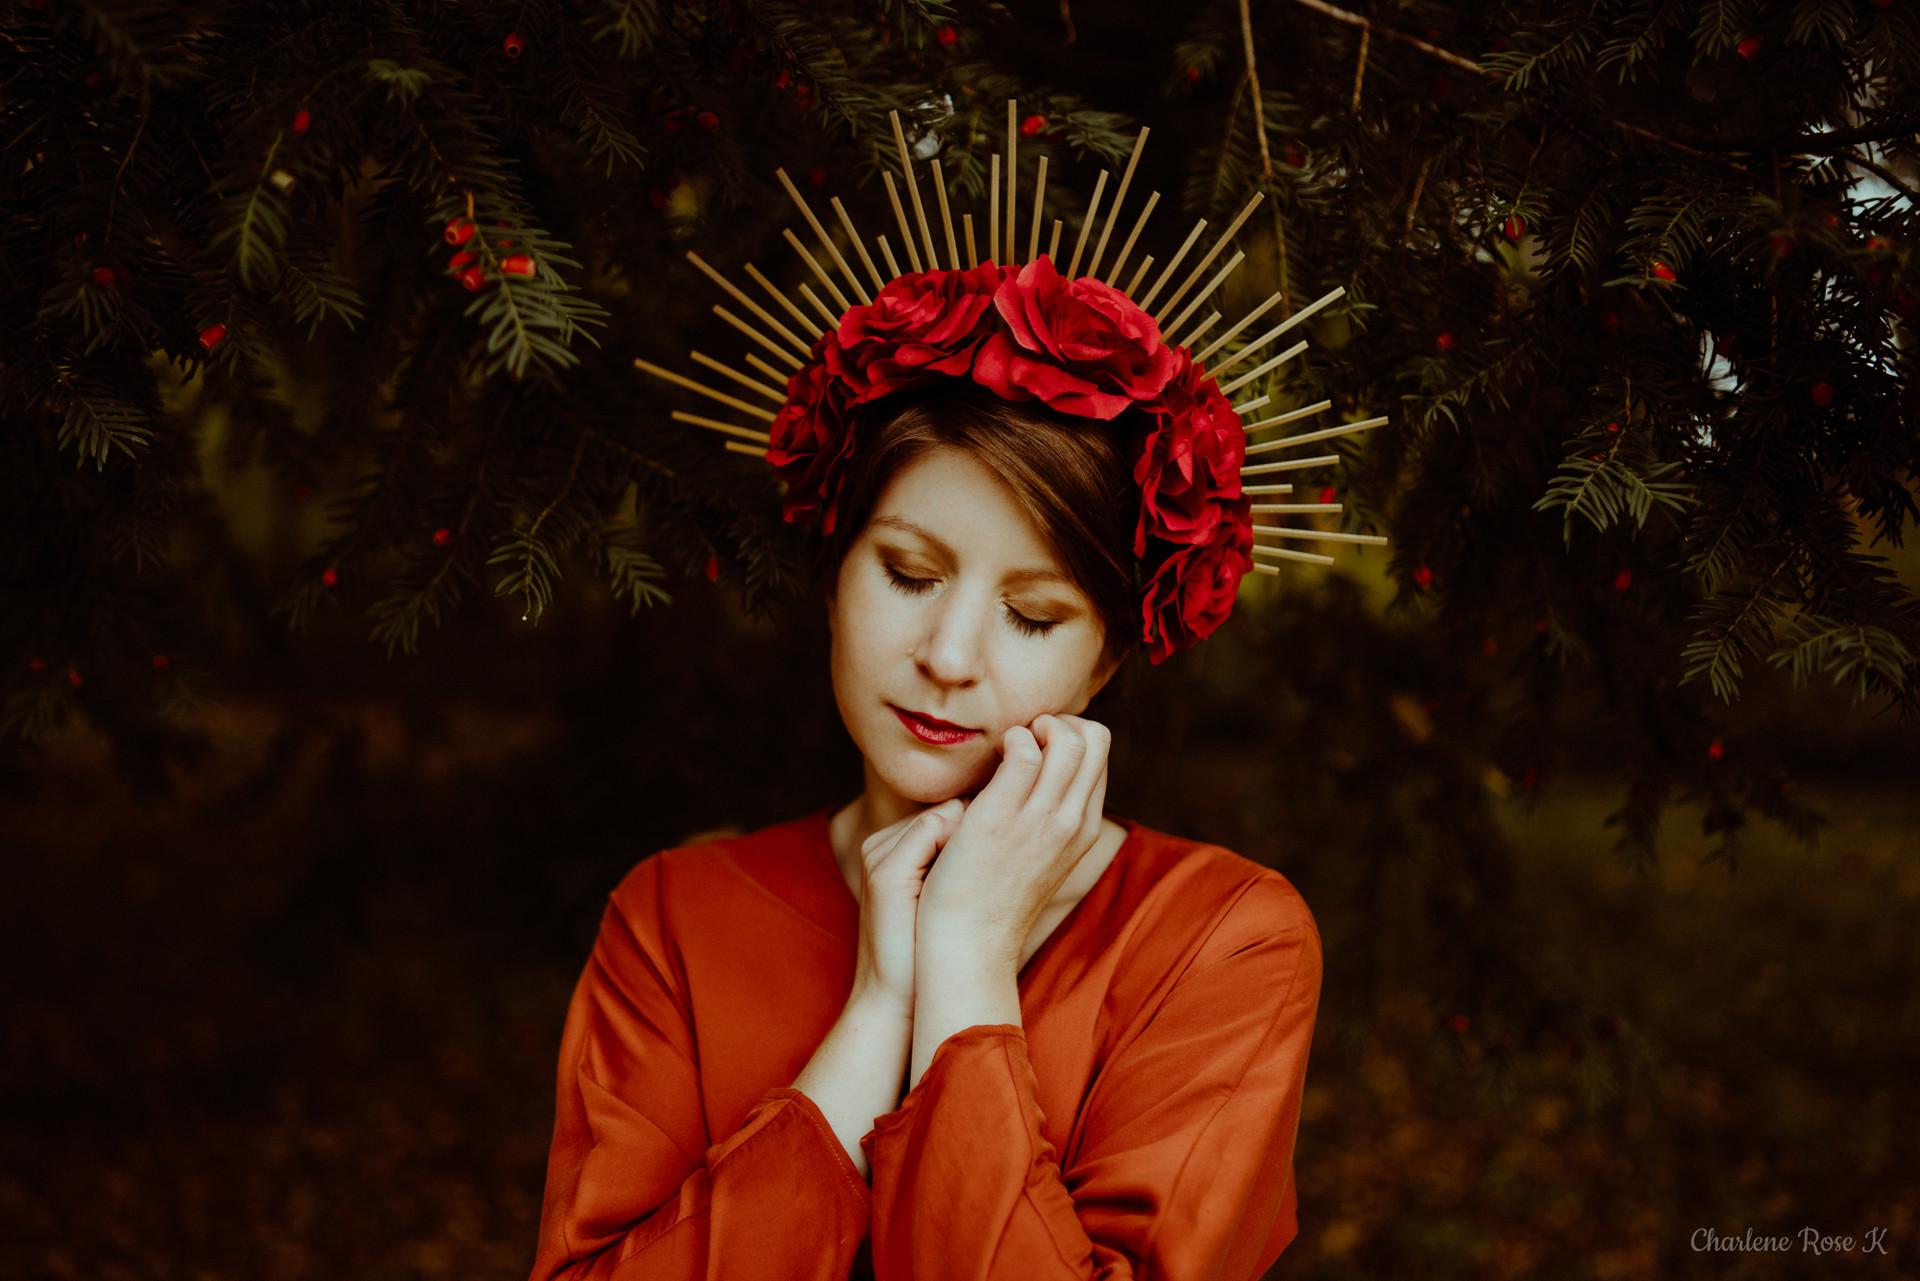 seance-photo-troyes-solo-femme-exterieur-automne-crk-13